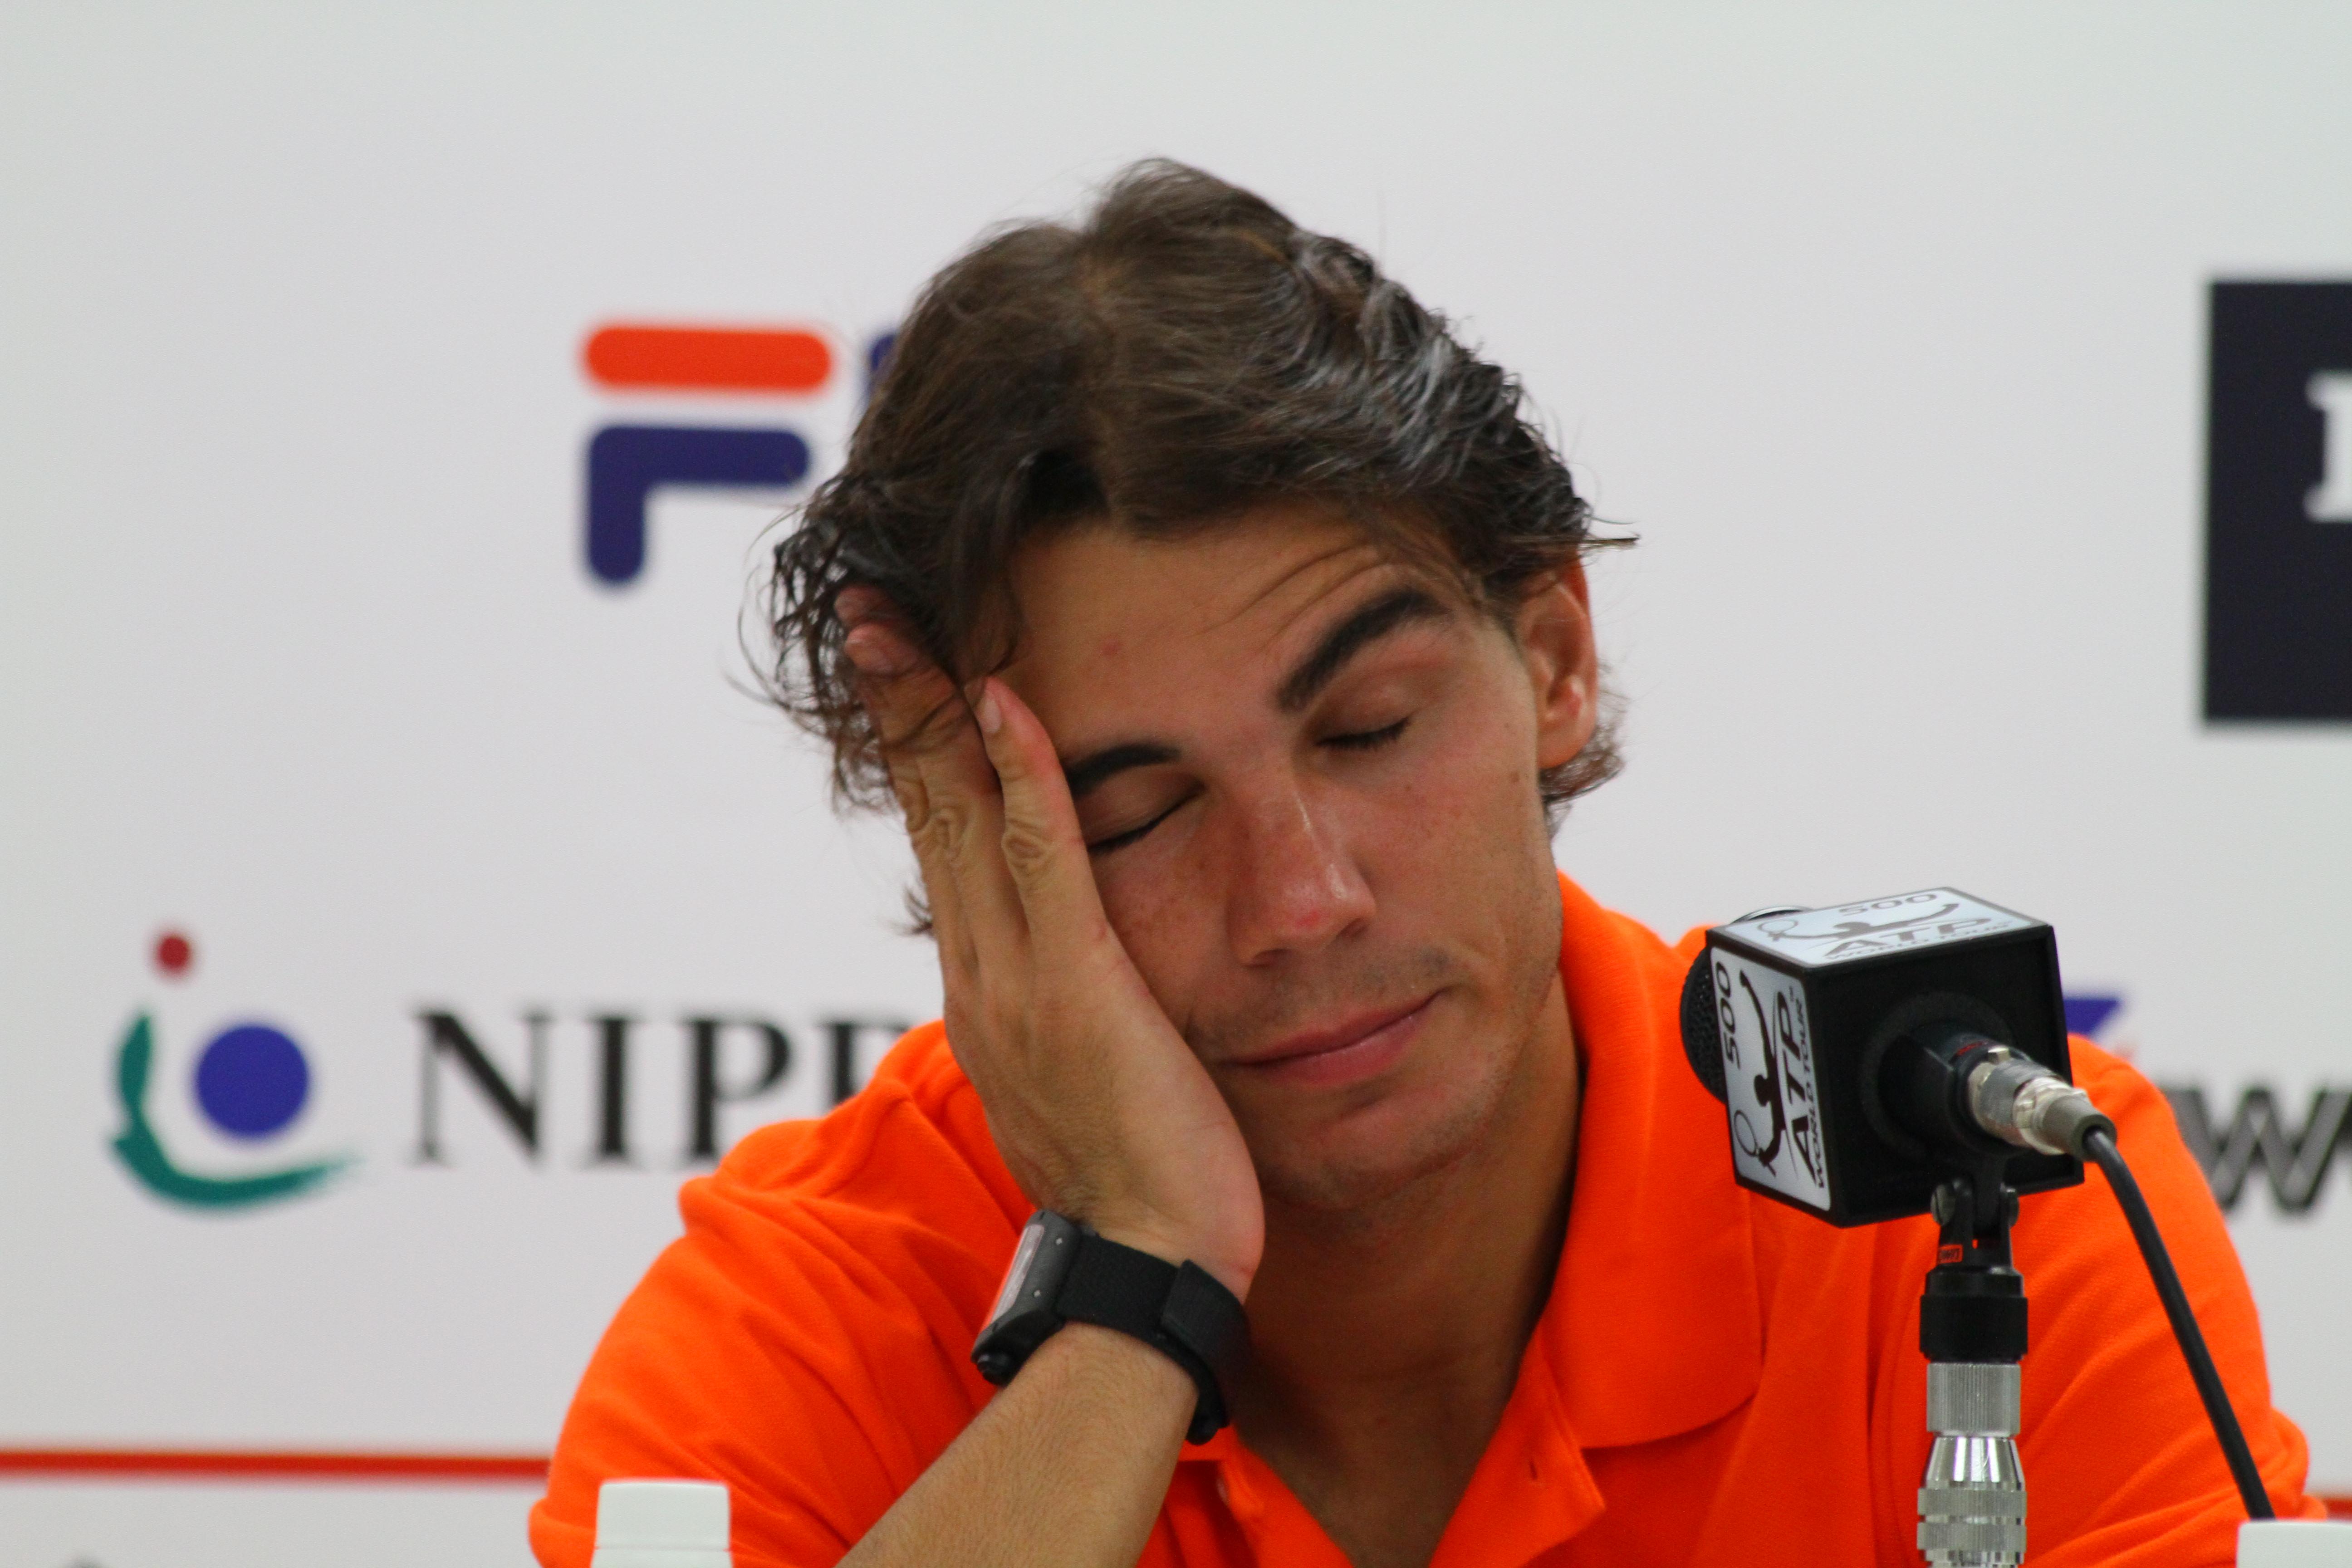 Nadal Wikipedia: Blackhairstylecuts.com